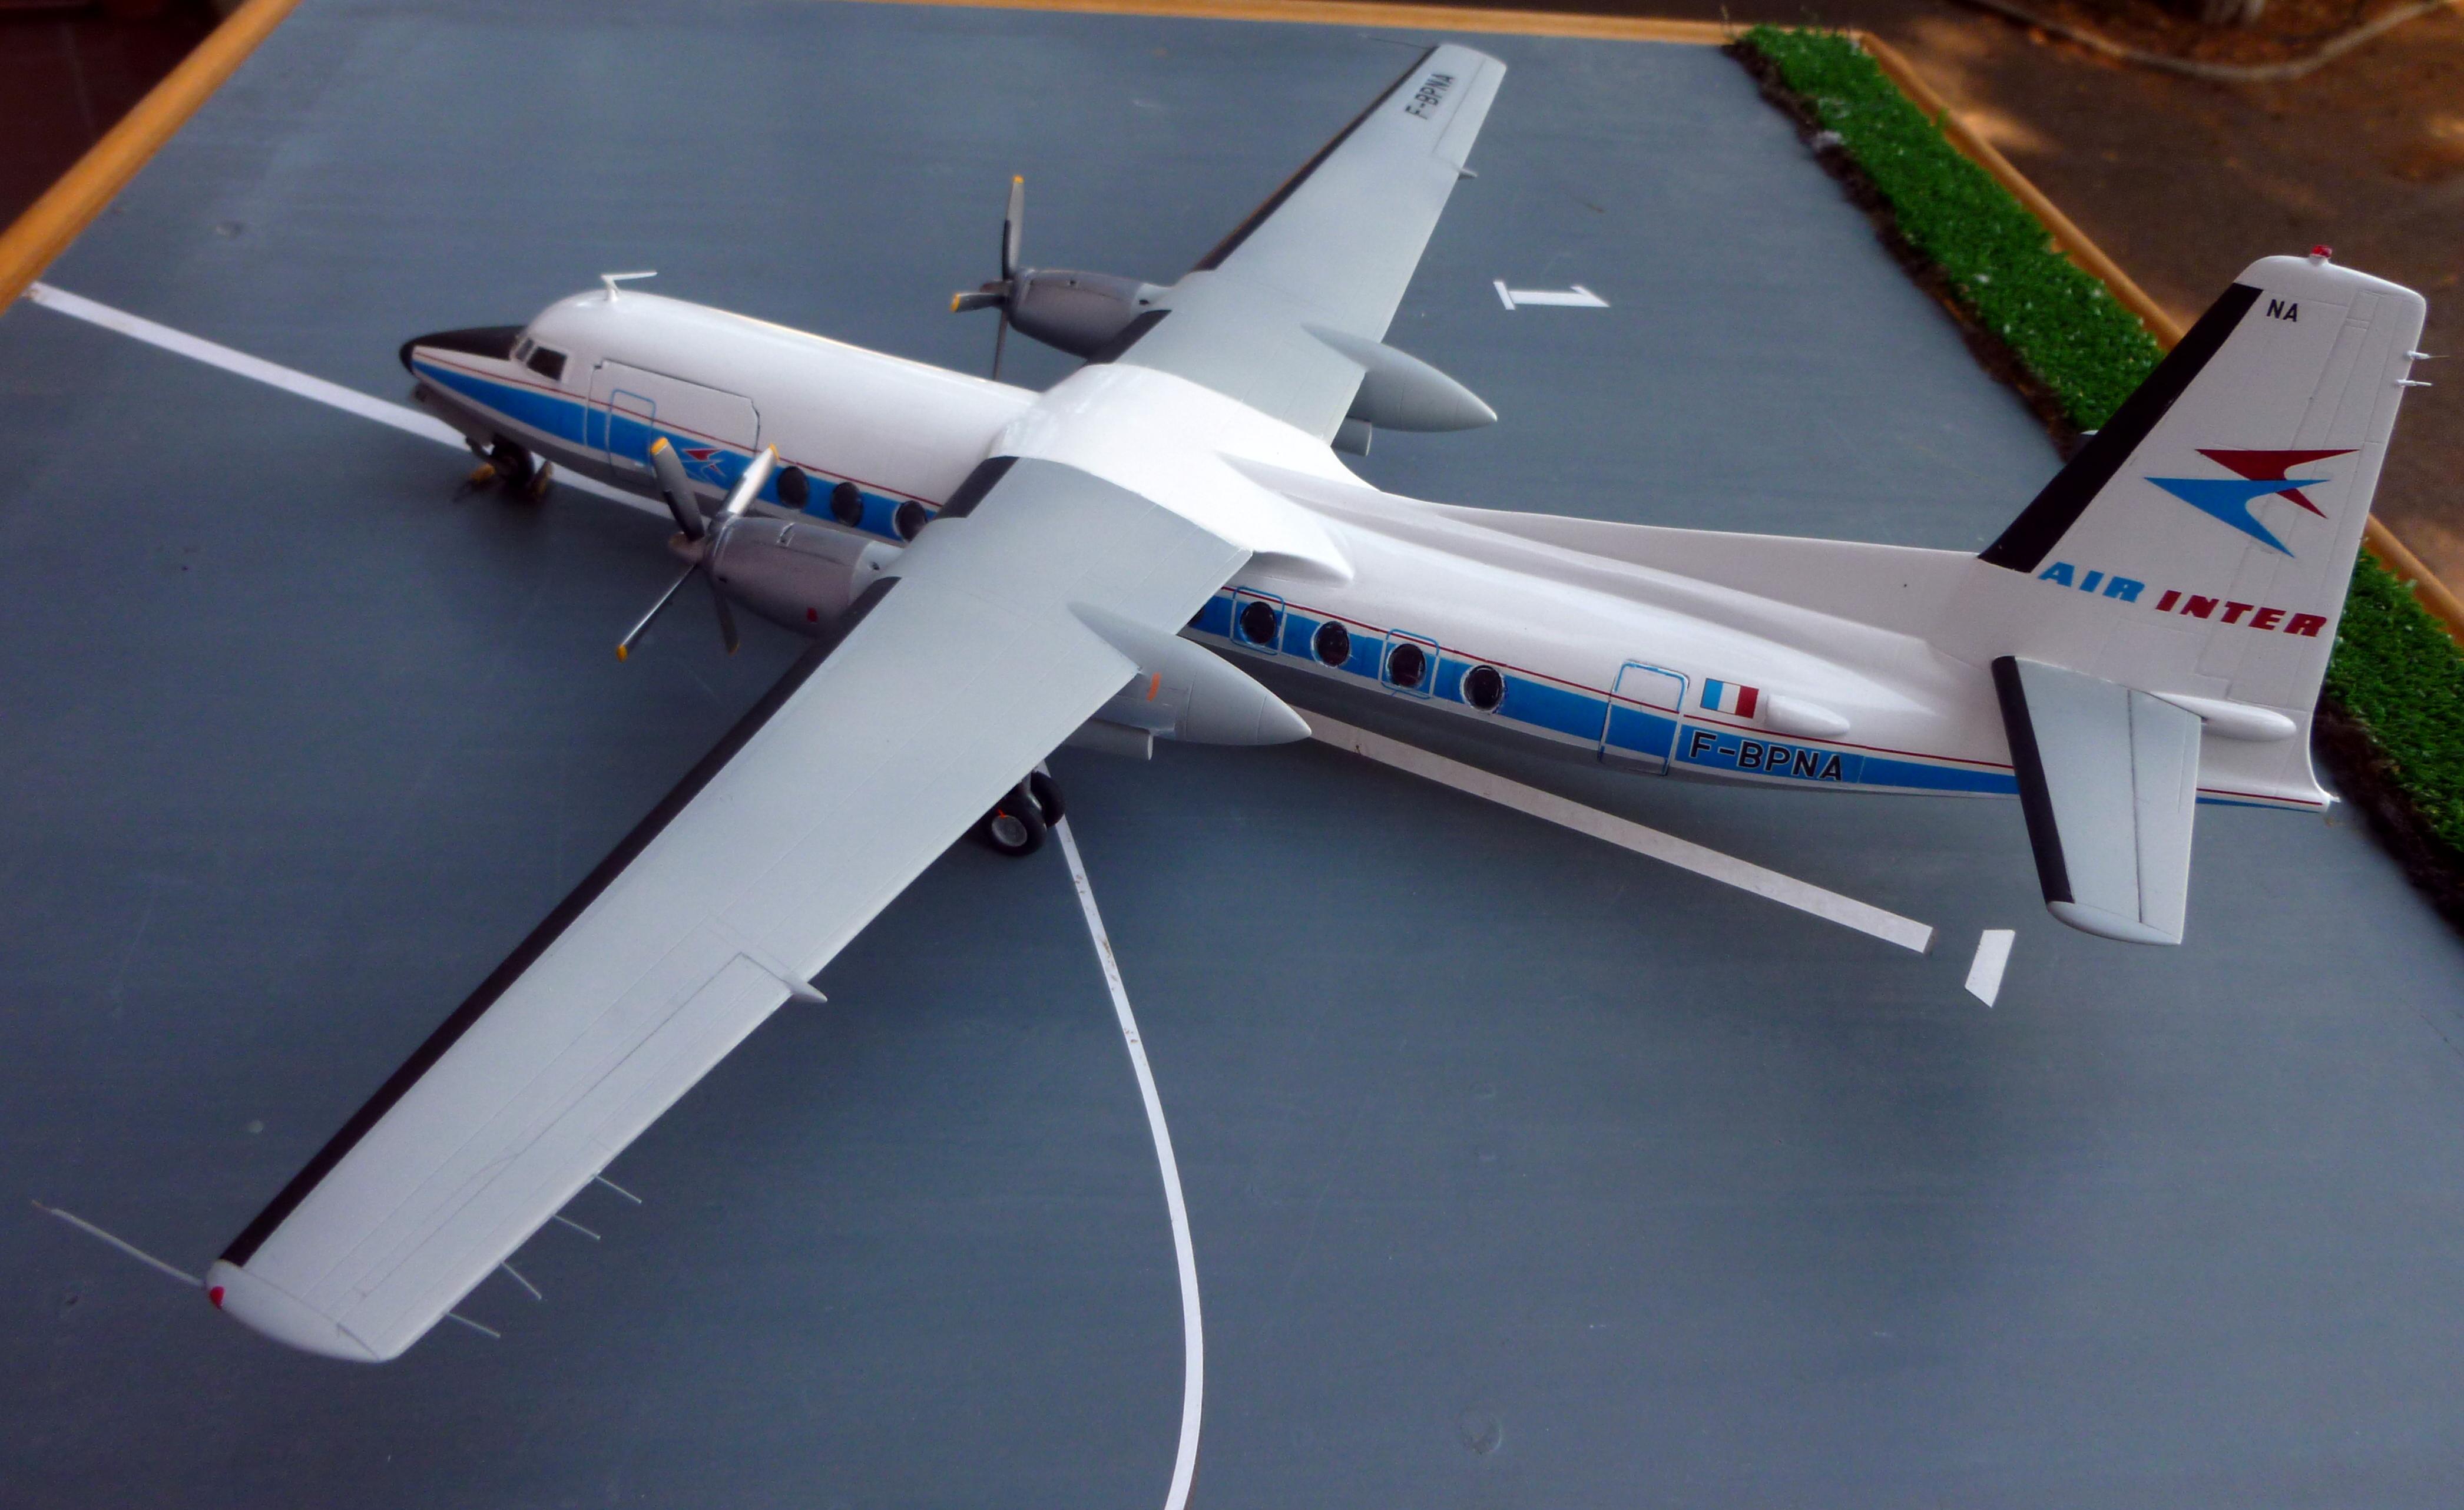 Fokker F 27-500  ESCI 1/72 scale - Page 2 18091105575721371115887938